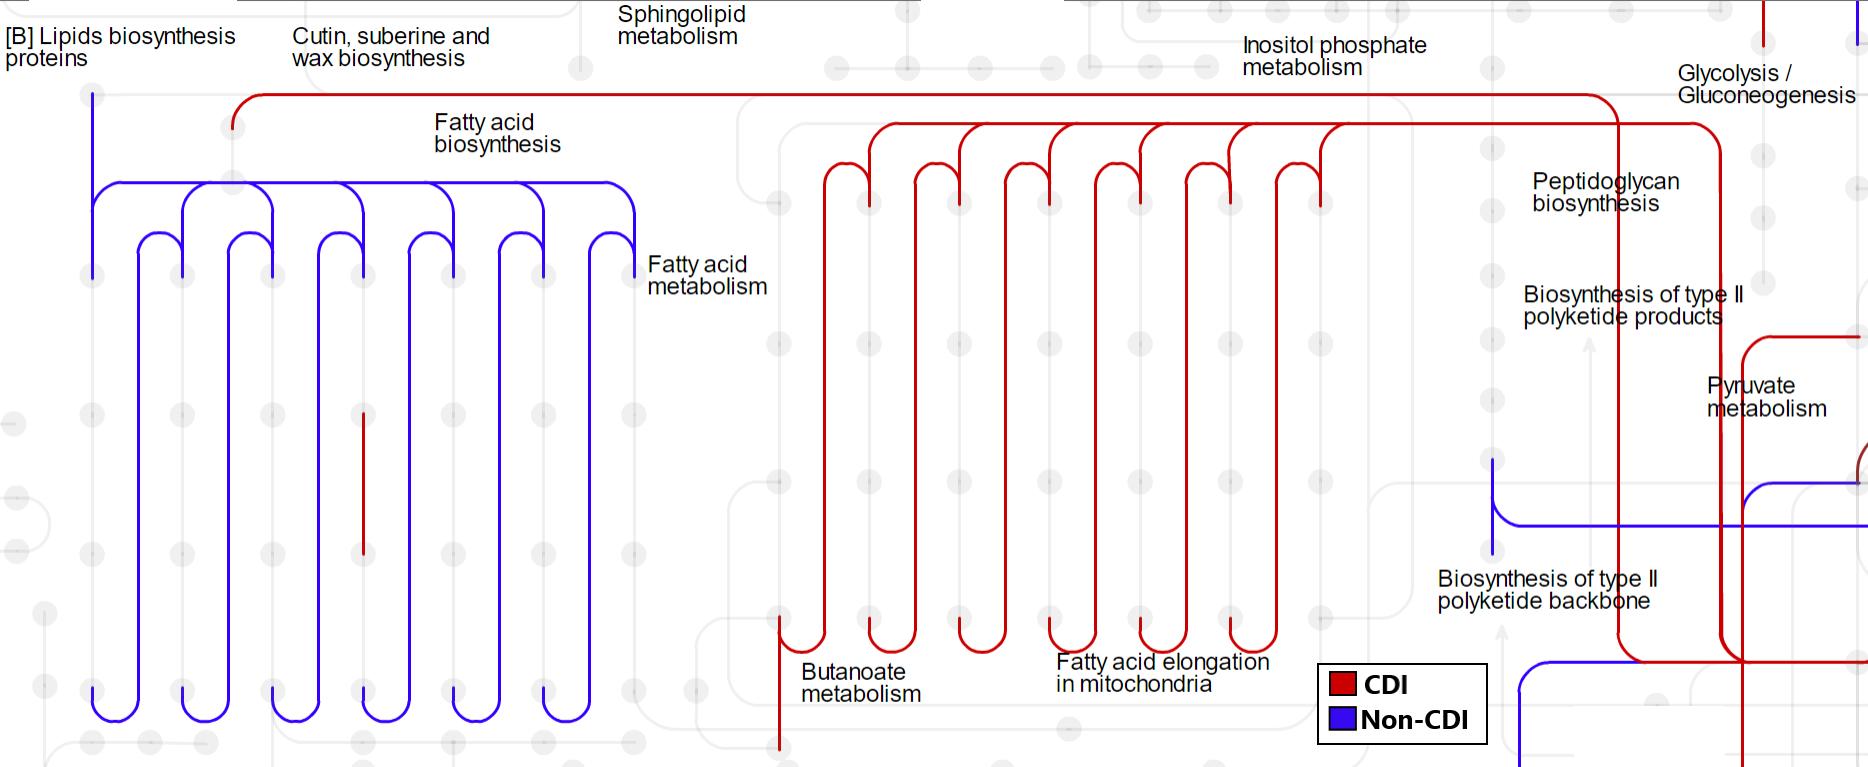 4.MT_Lipid metabolism.png